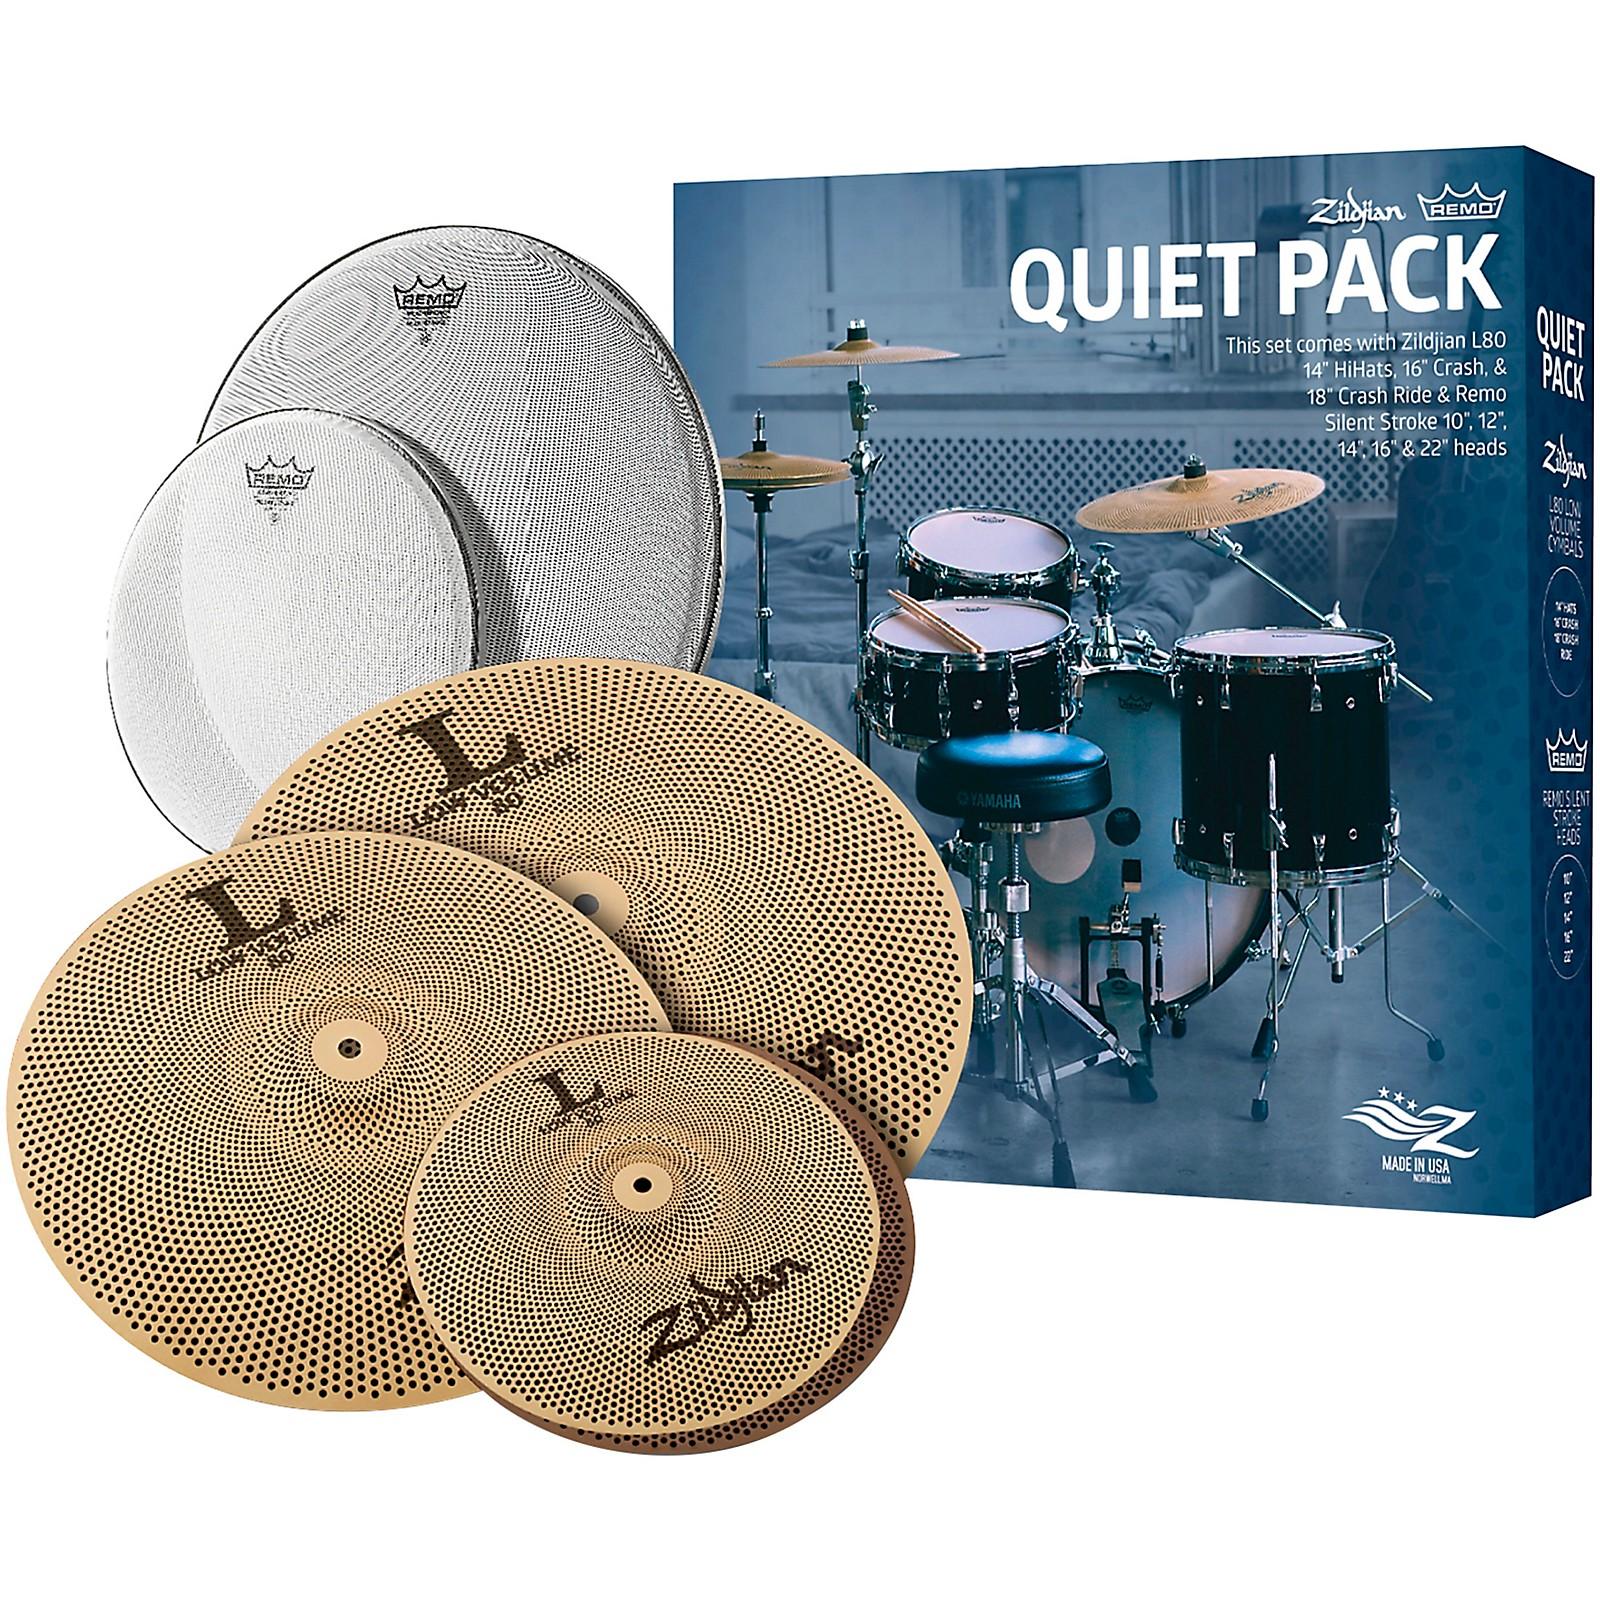 Zildjian LV468 Low Volume Cymbal Set with Remo Silent Stroke Heads